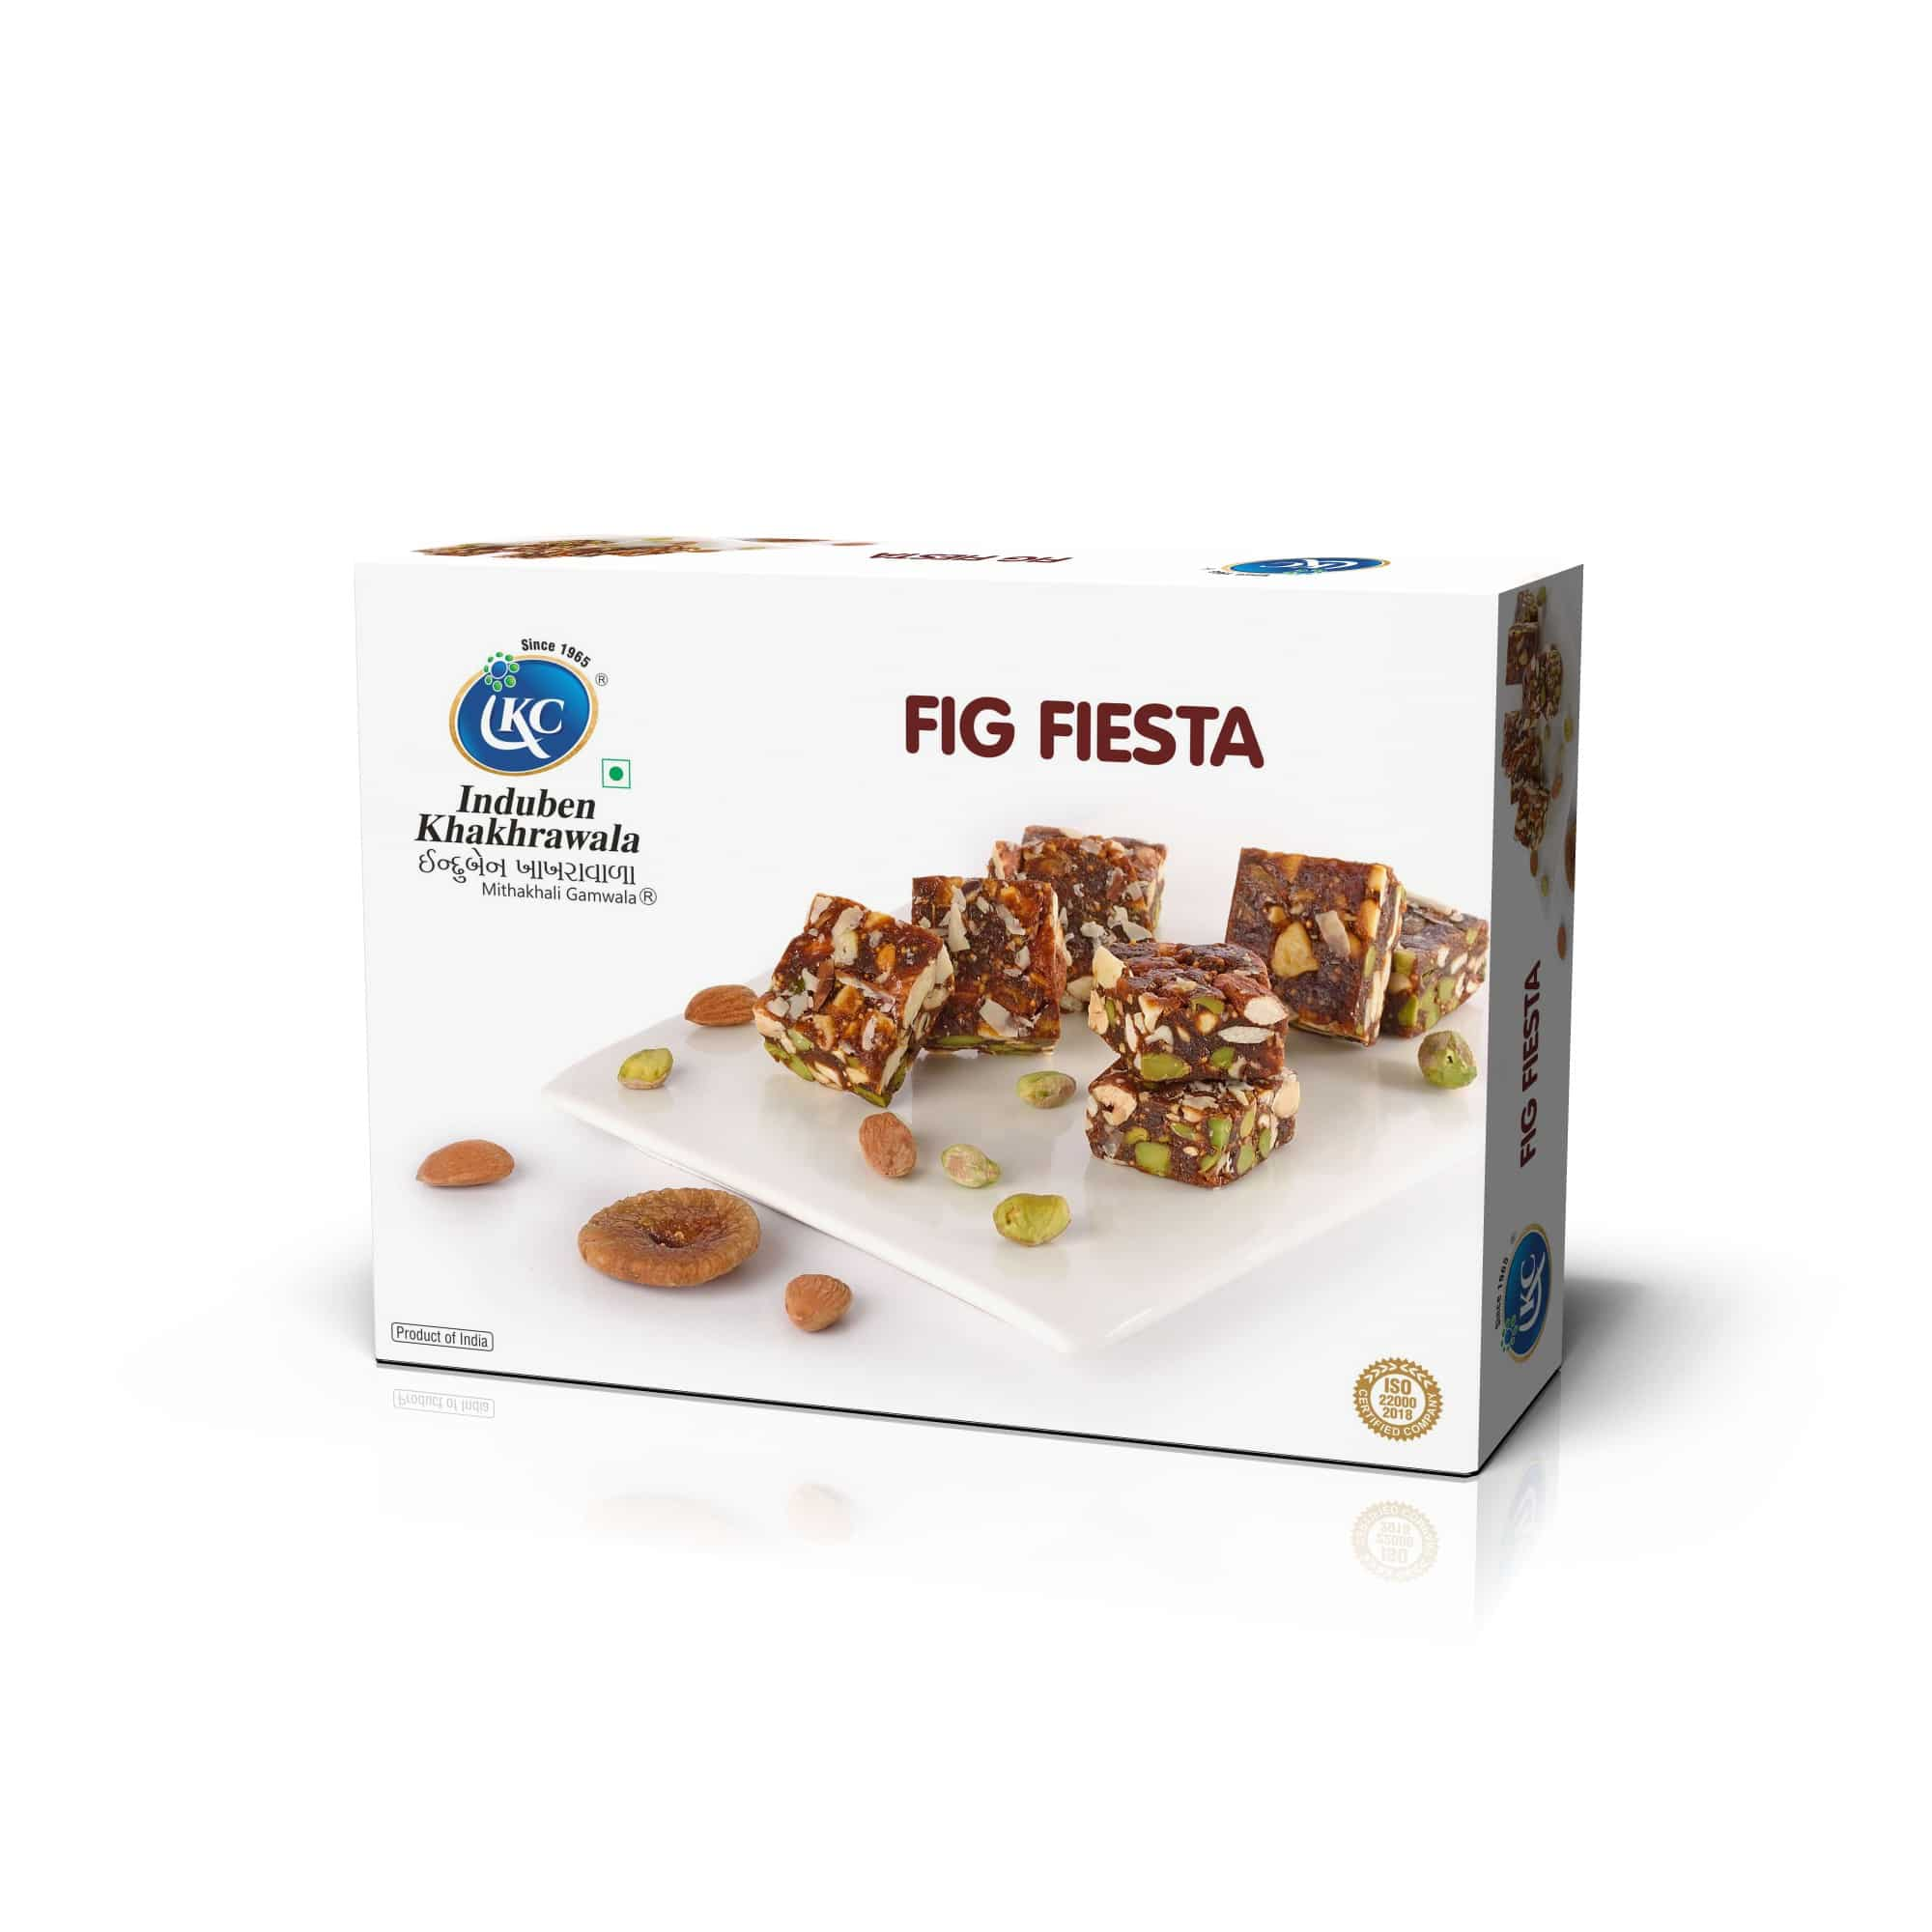 Buy Online Fig Fiesta - Sugar-Free | Induben Khakhrawala | Traditional Indian Sweets From Induben, Get Latest Price & Recipe Of Fig Fiesta Sweets.